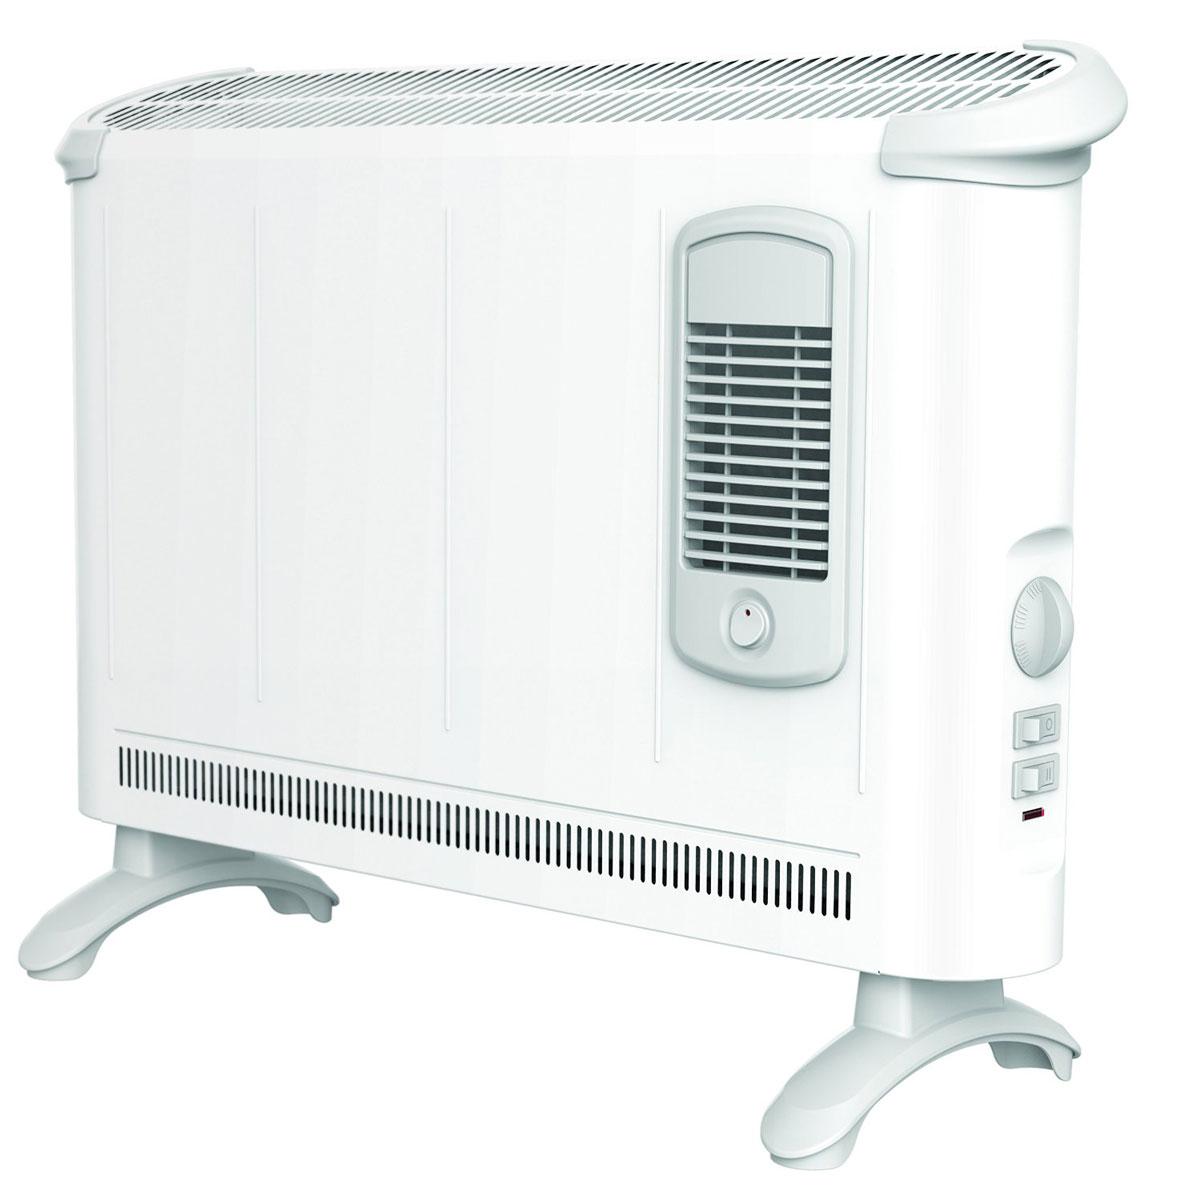 EWT Clima 281 TSF, White конвектор обогреватель ewt c 120 lcd